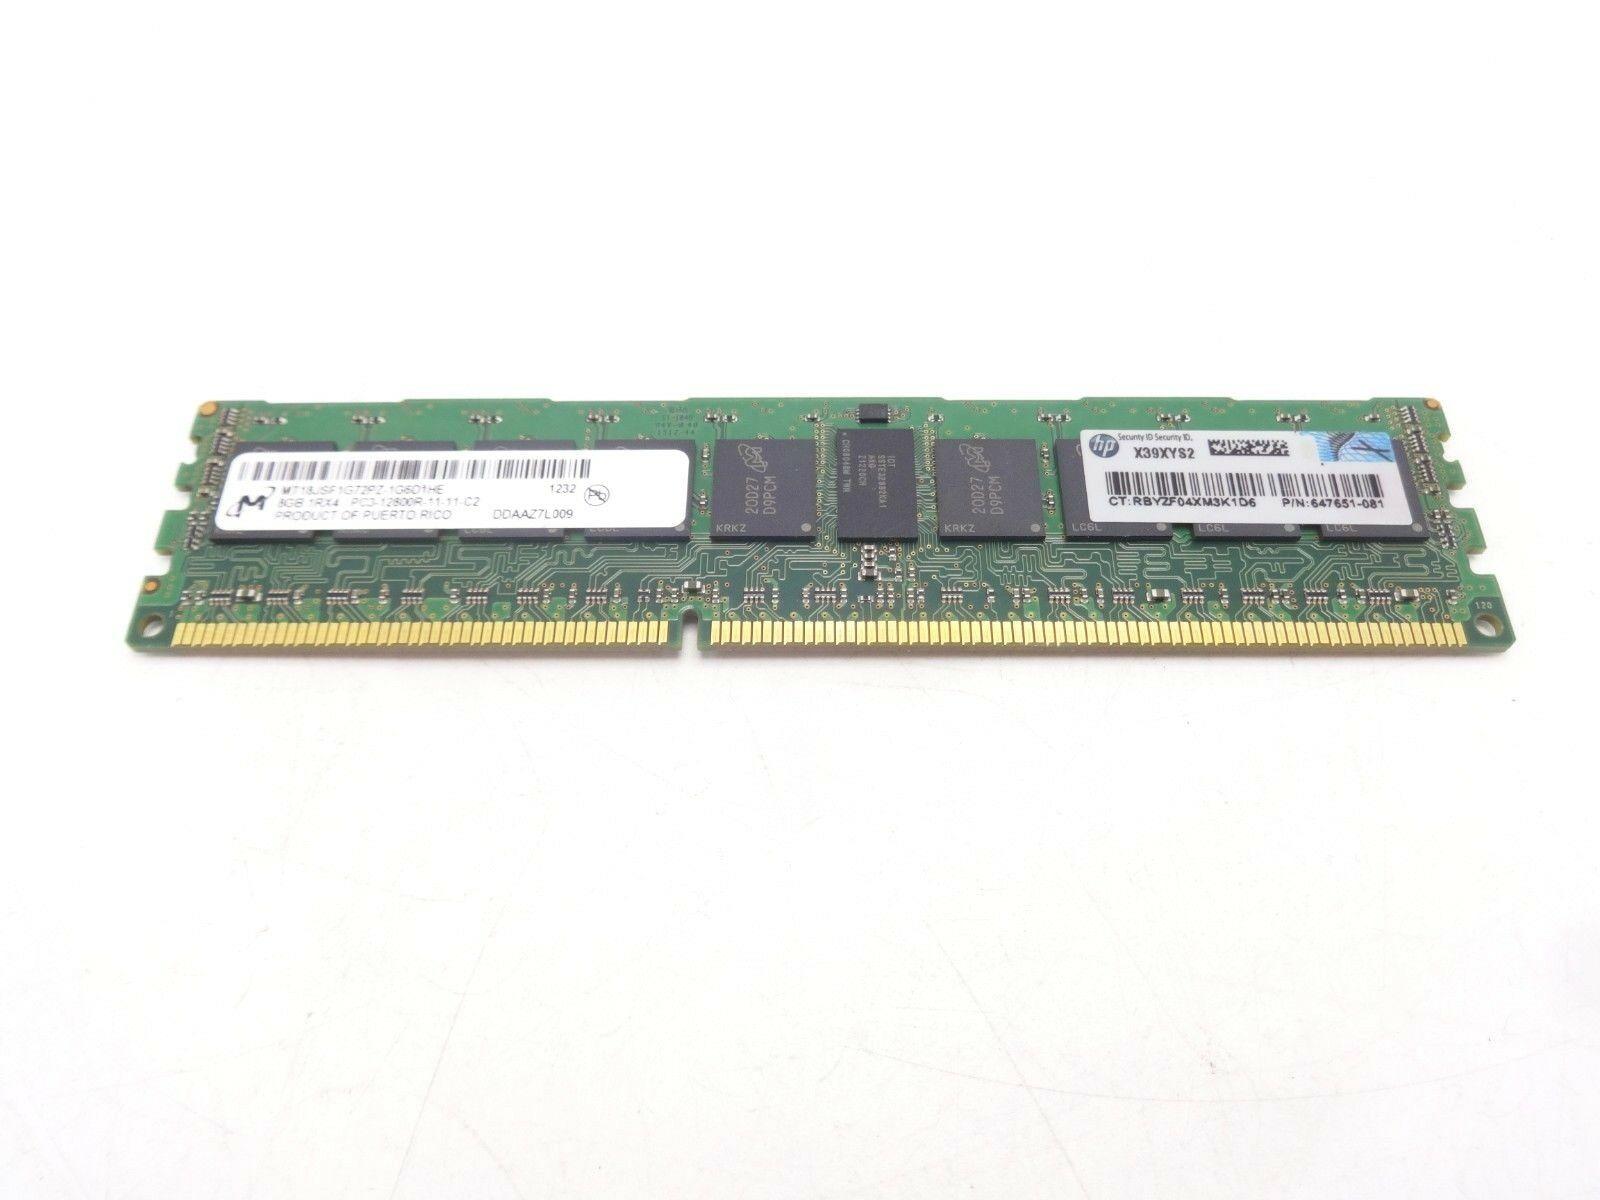 1x8GB HMT31GR7BFR4C-PB HYNIX 8GB 2Rx4 PC3-12800R 1.5V MEMORY MODULE